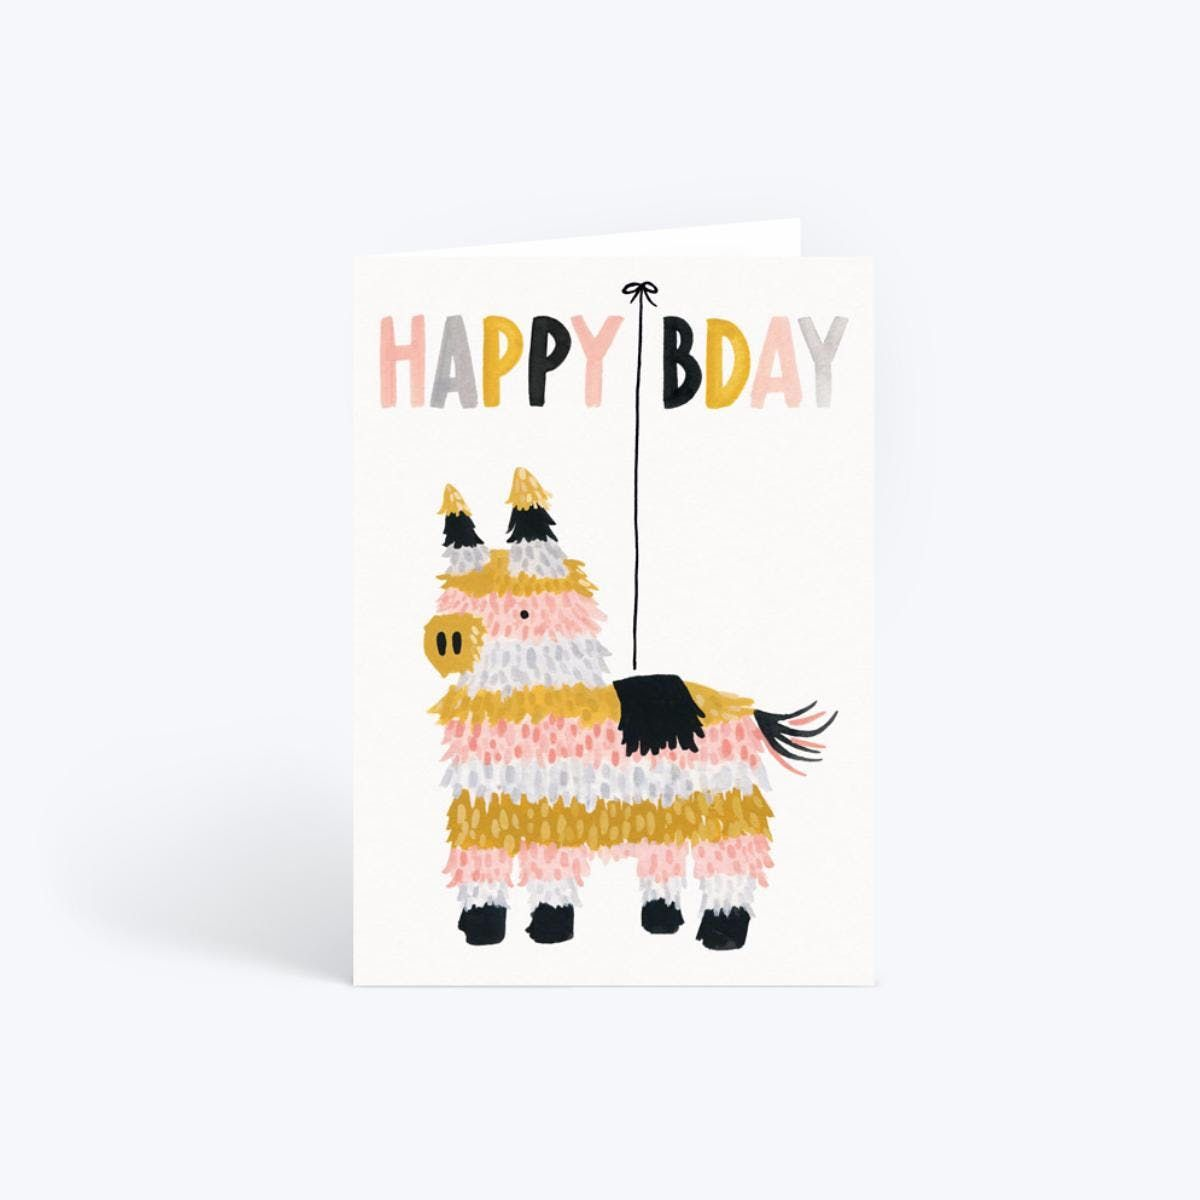 Birthday Pinata Birthday Card Papier Birthday Card Online Birthday Cards For Her Birthday Cards